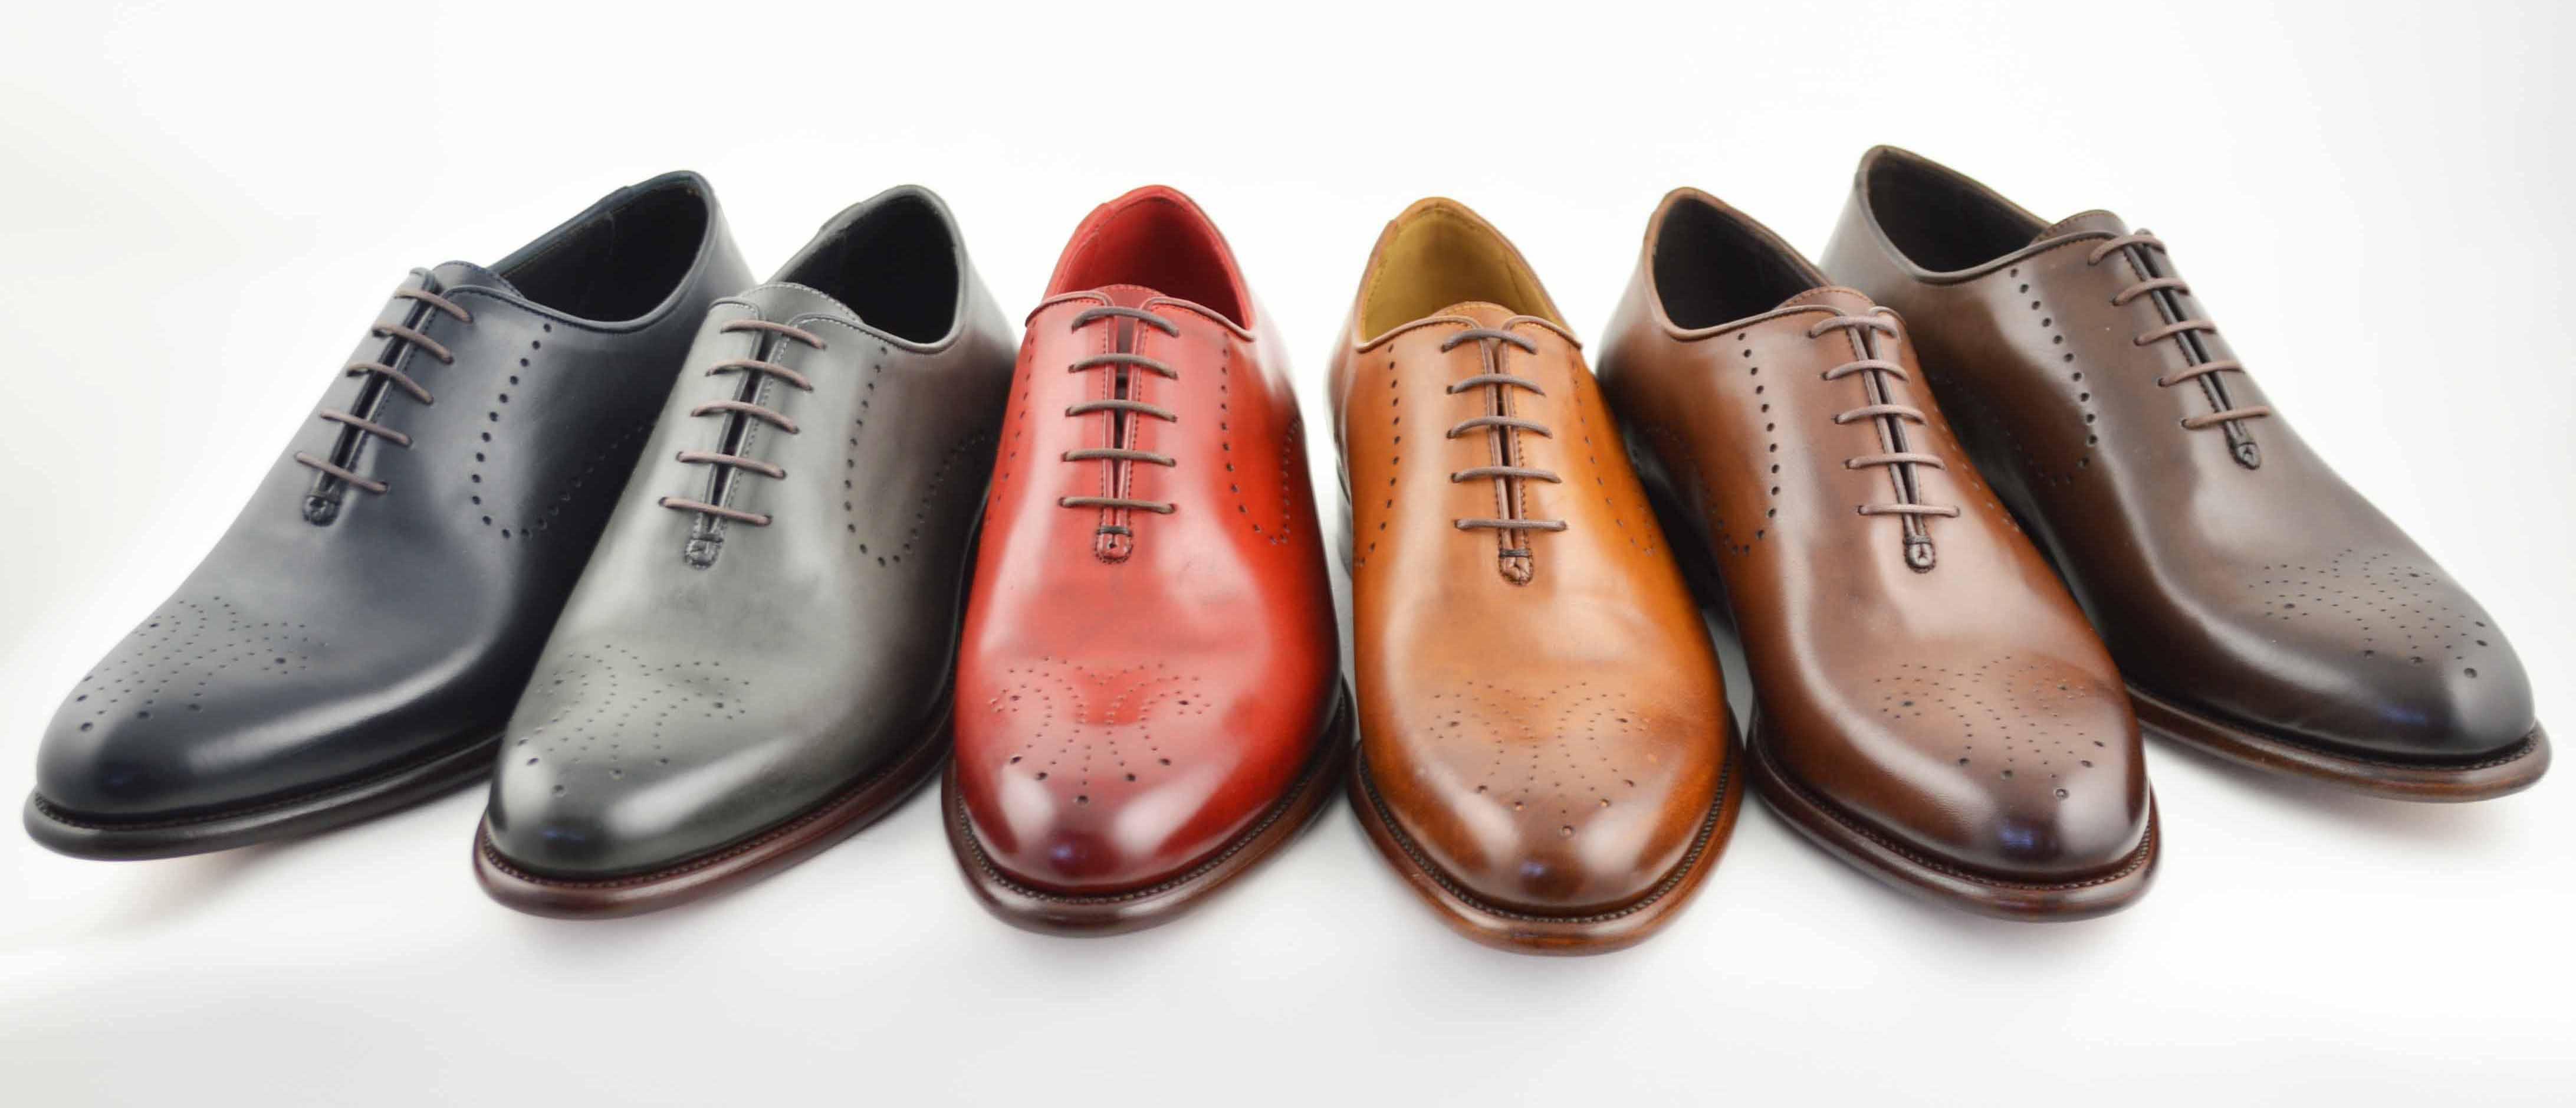 739b23567860f Tipos de zapatos para hombre